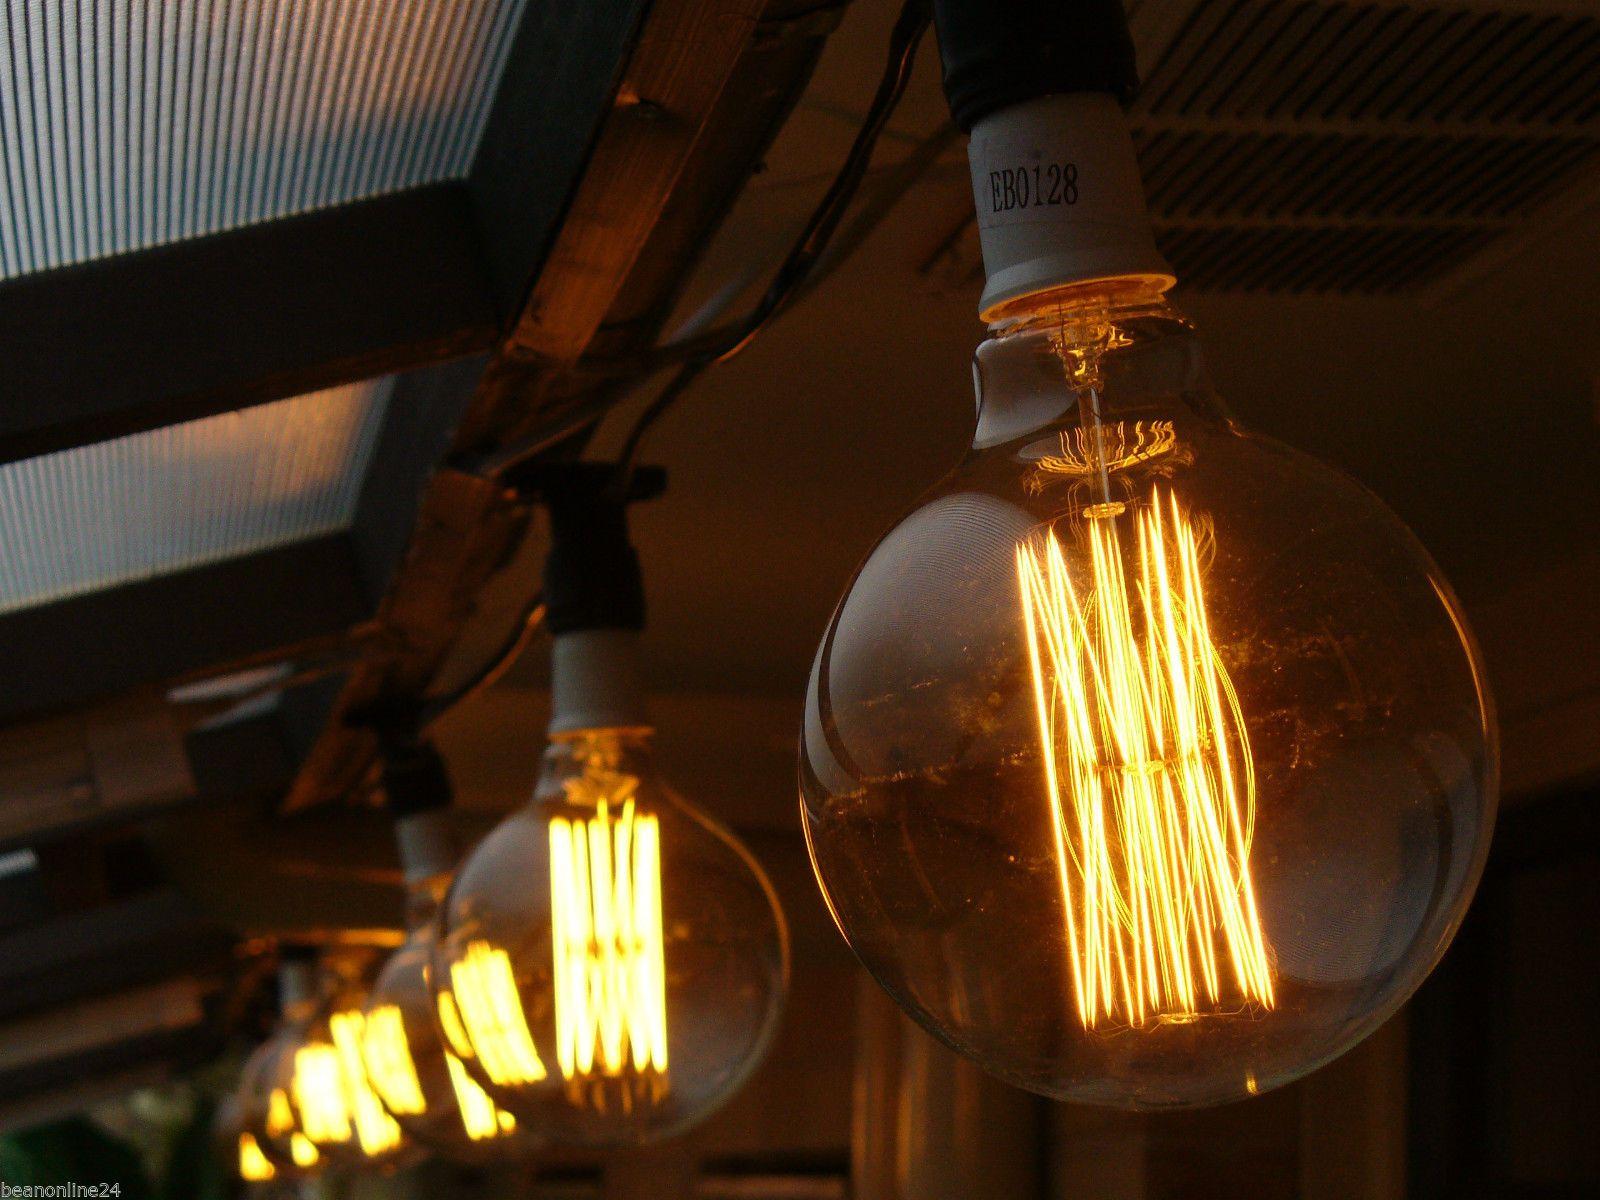 10 Piece Vintage Edison Festoon Party String Light KIT Globes Included | eBay